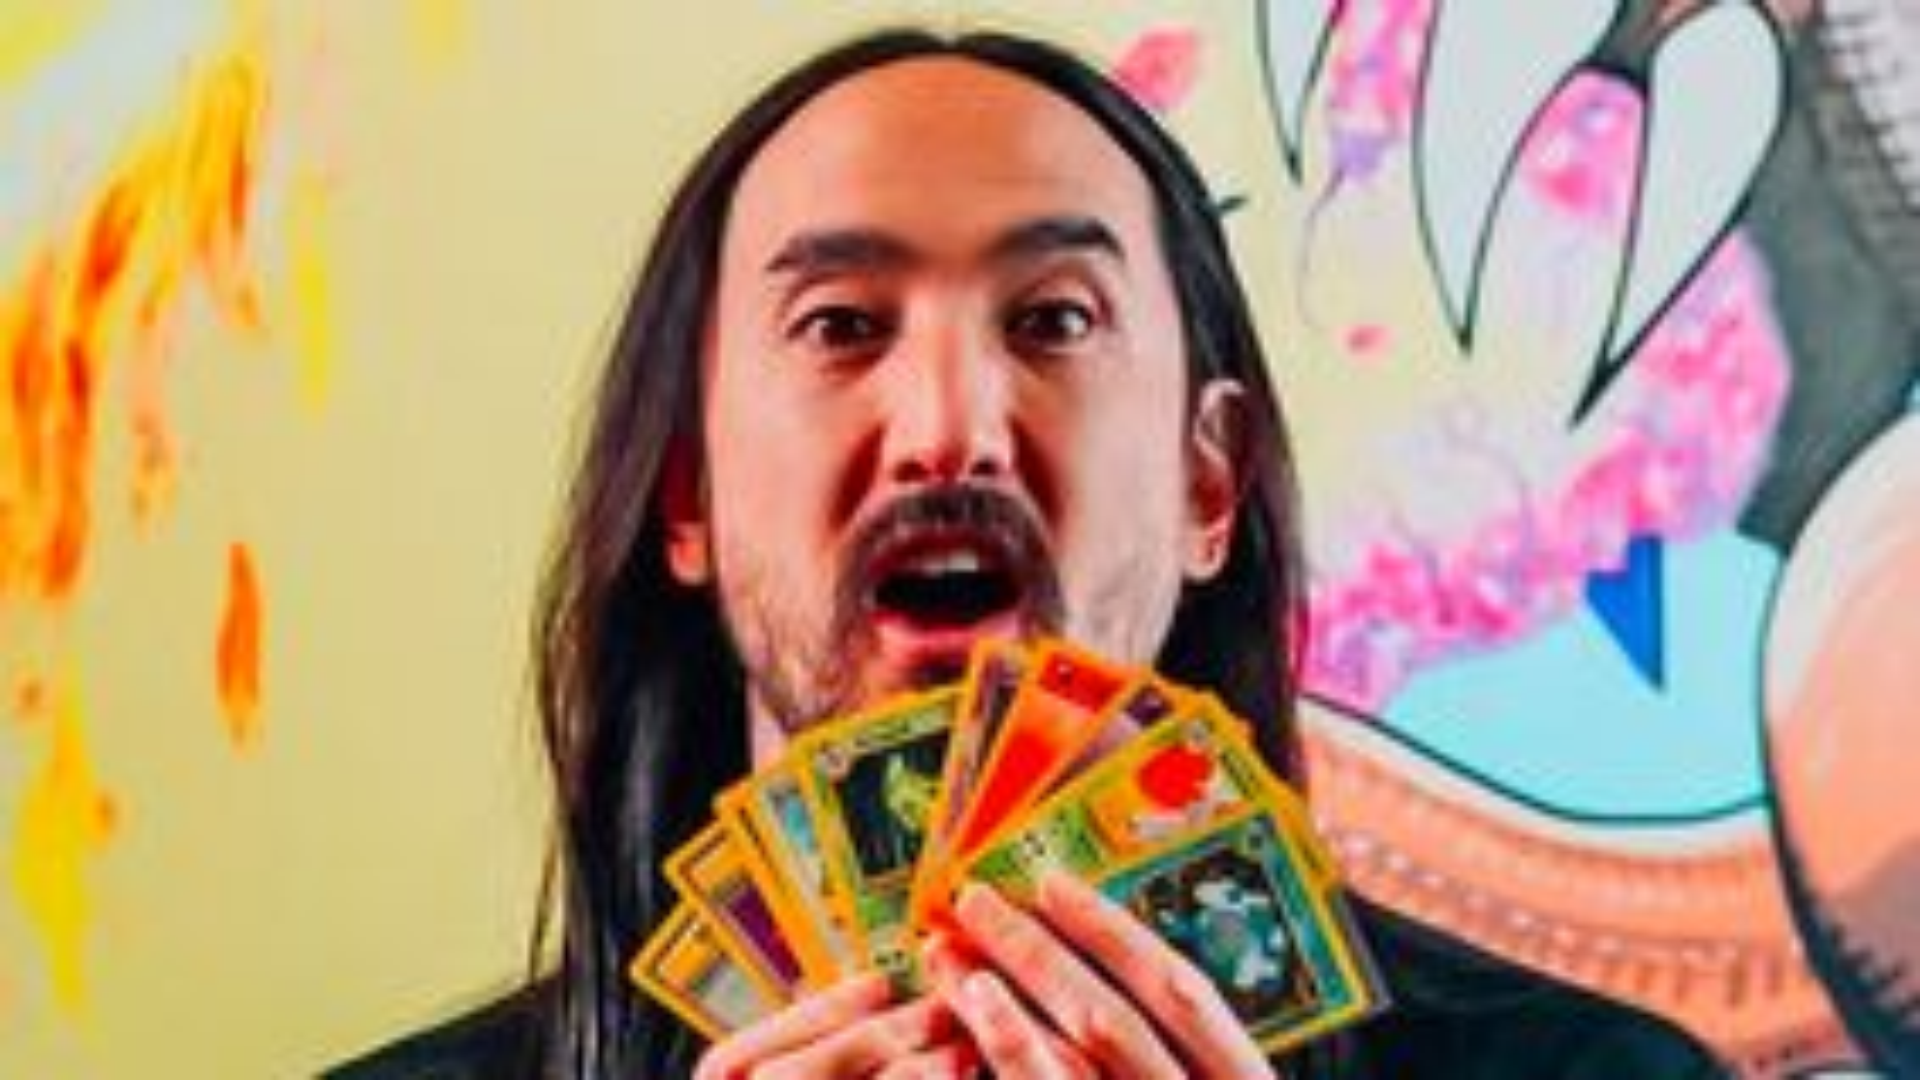 Steve Aoki holding Pokemon cards